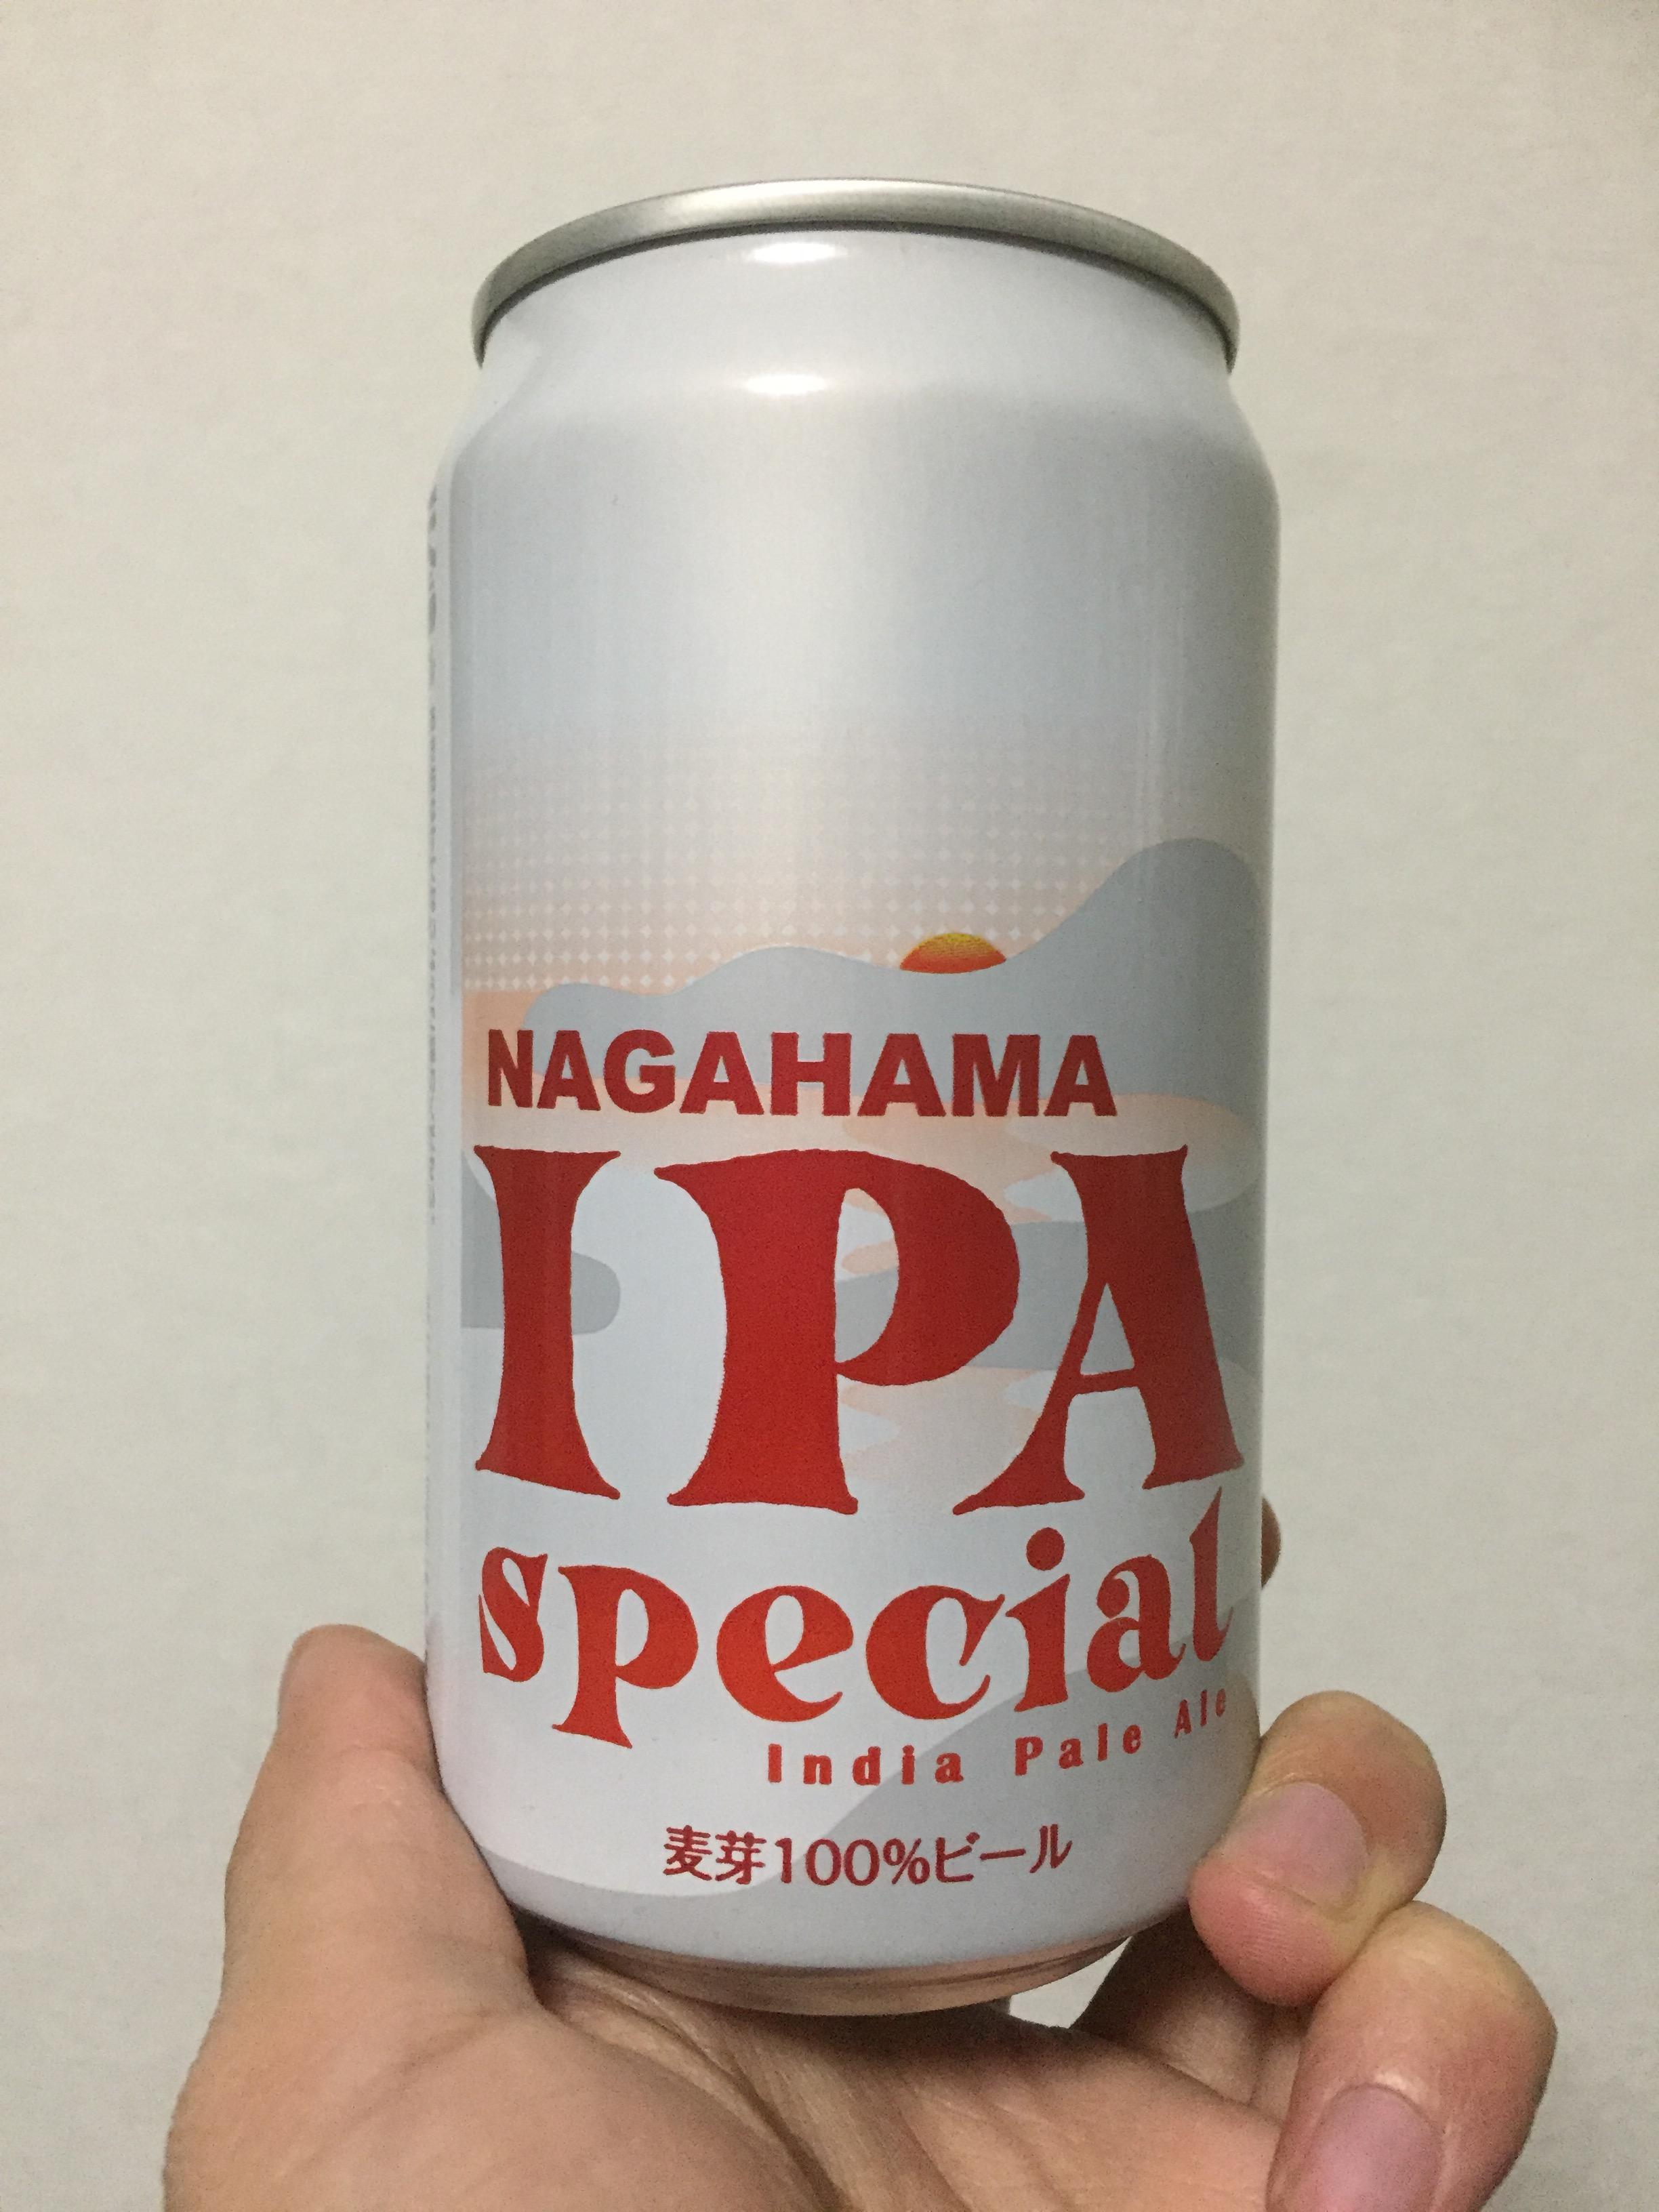 NAGAHAMA IPA SPECIAL について思う事